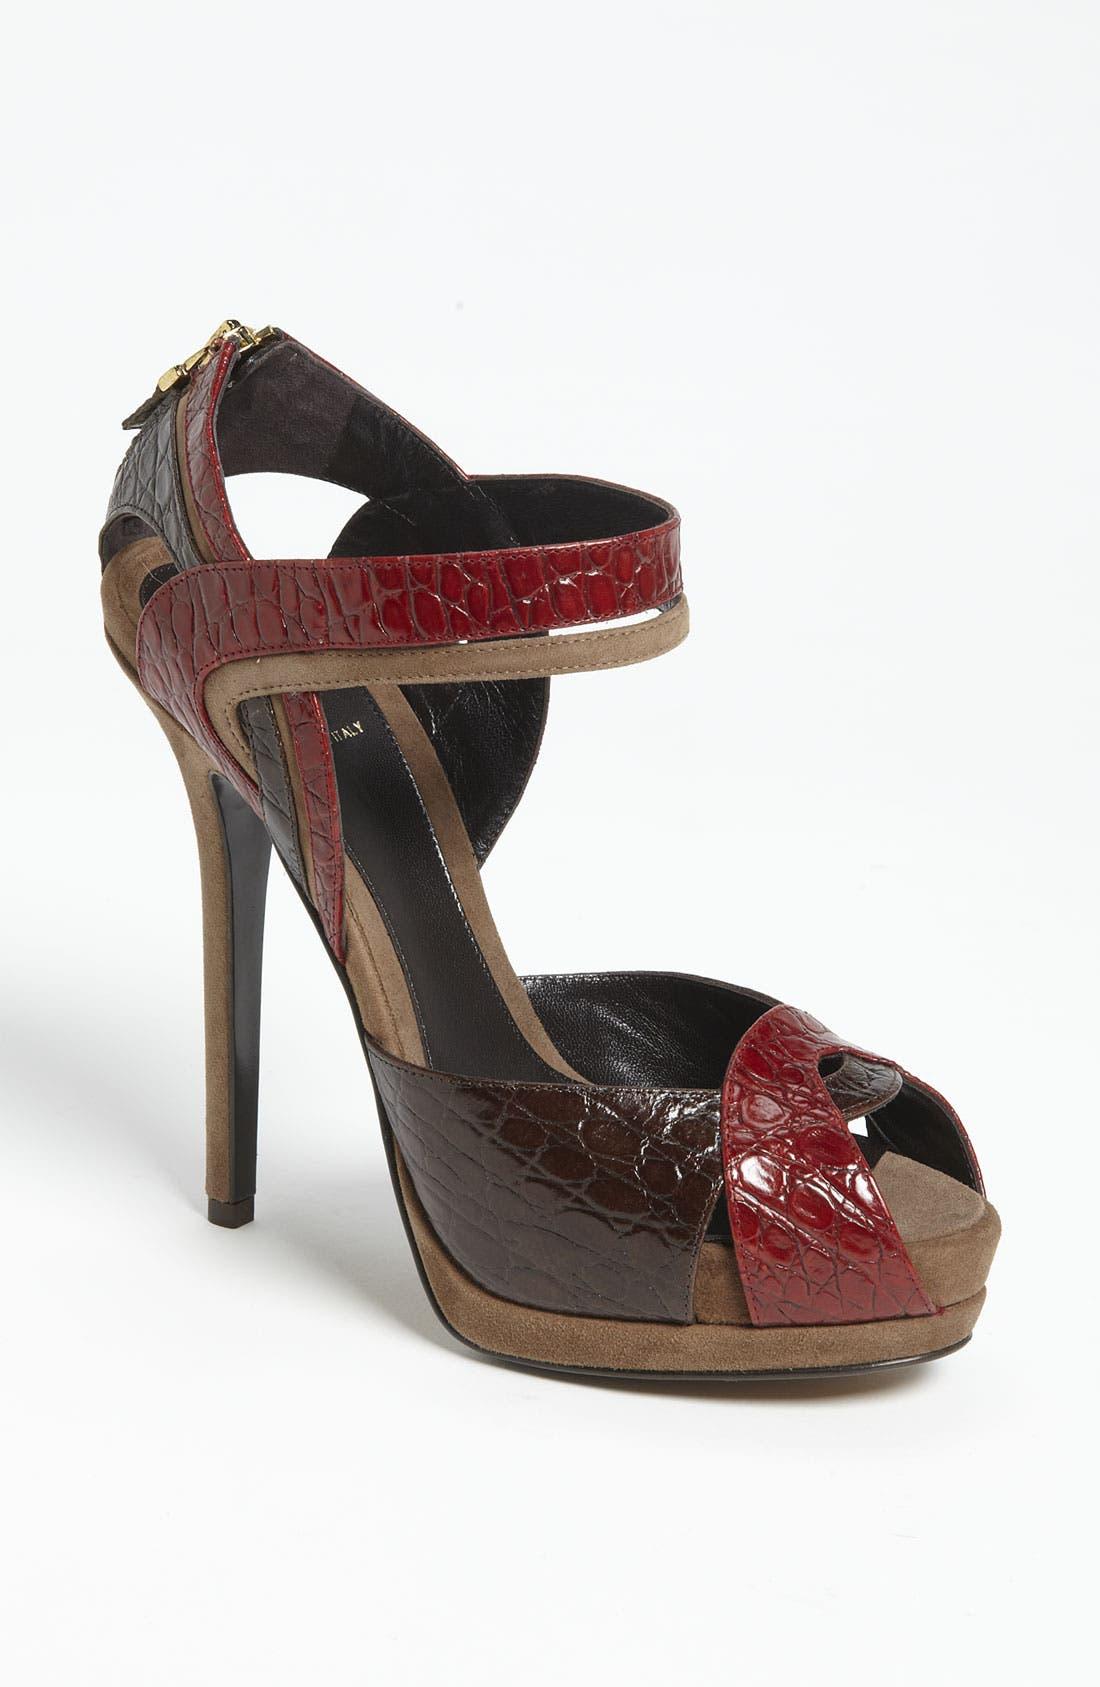 Main Image - Fendi 'Let Me In' Ankle Strap Sandal